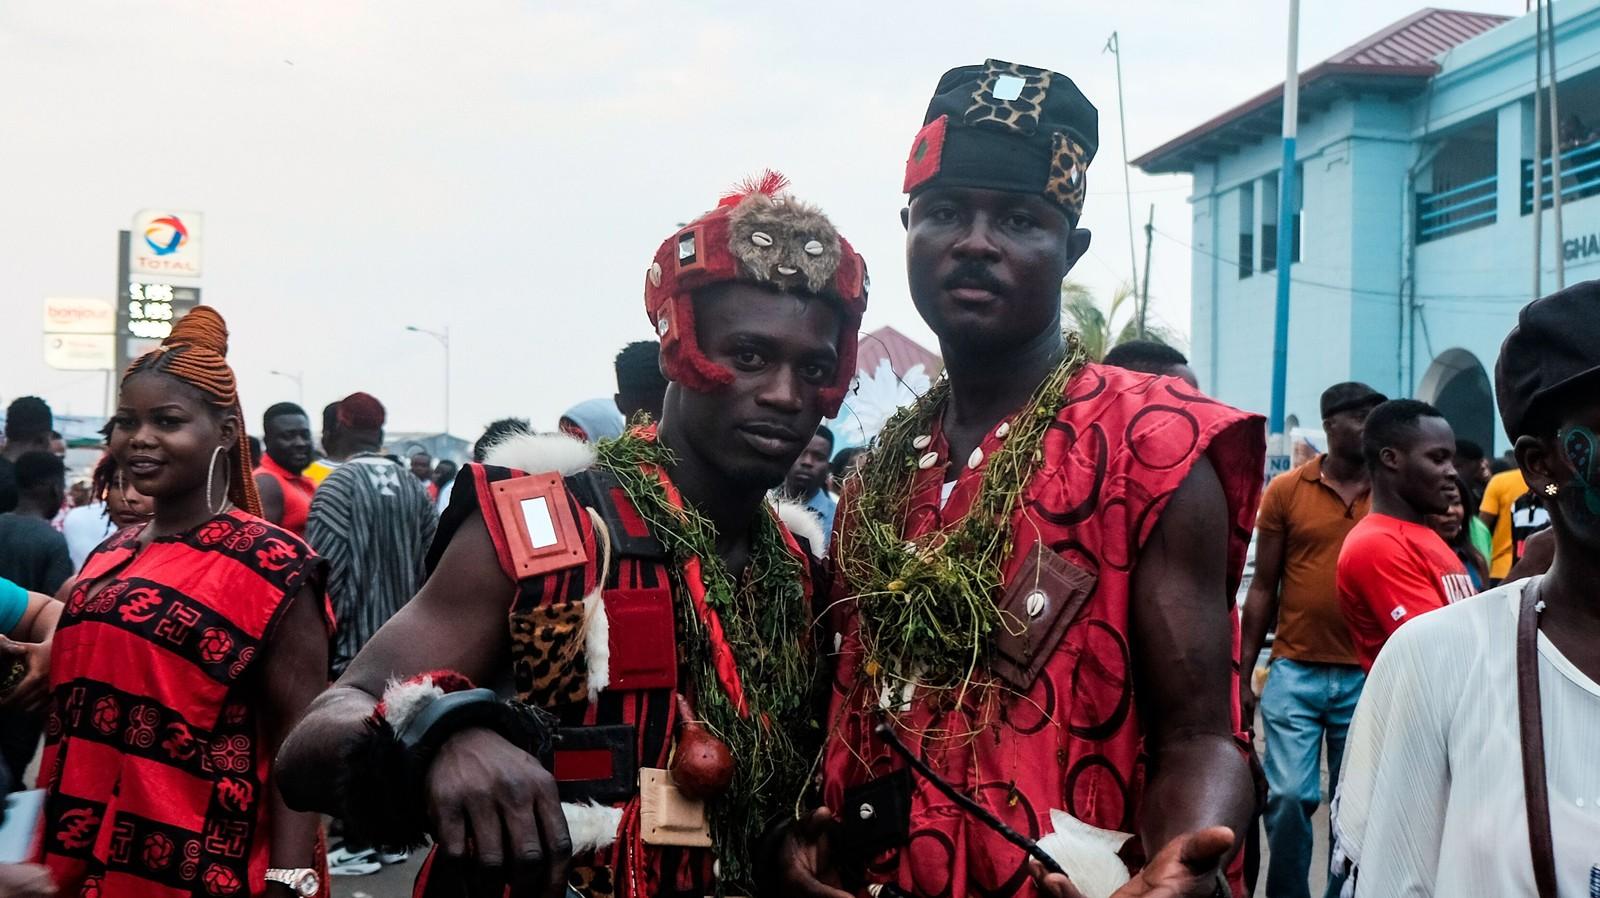 Africa's Biggest Street Art Festival Will Make You Not Hate Street Art